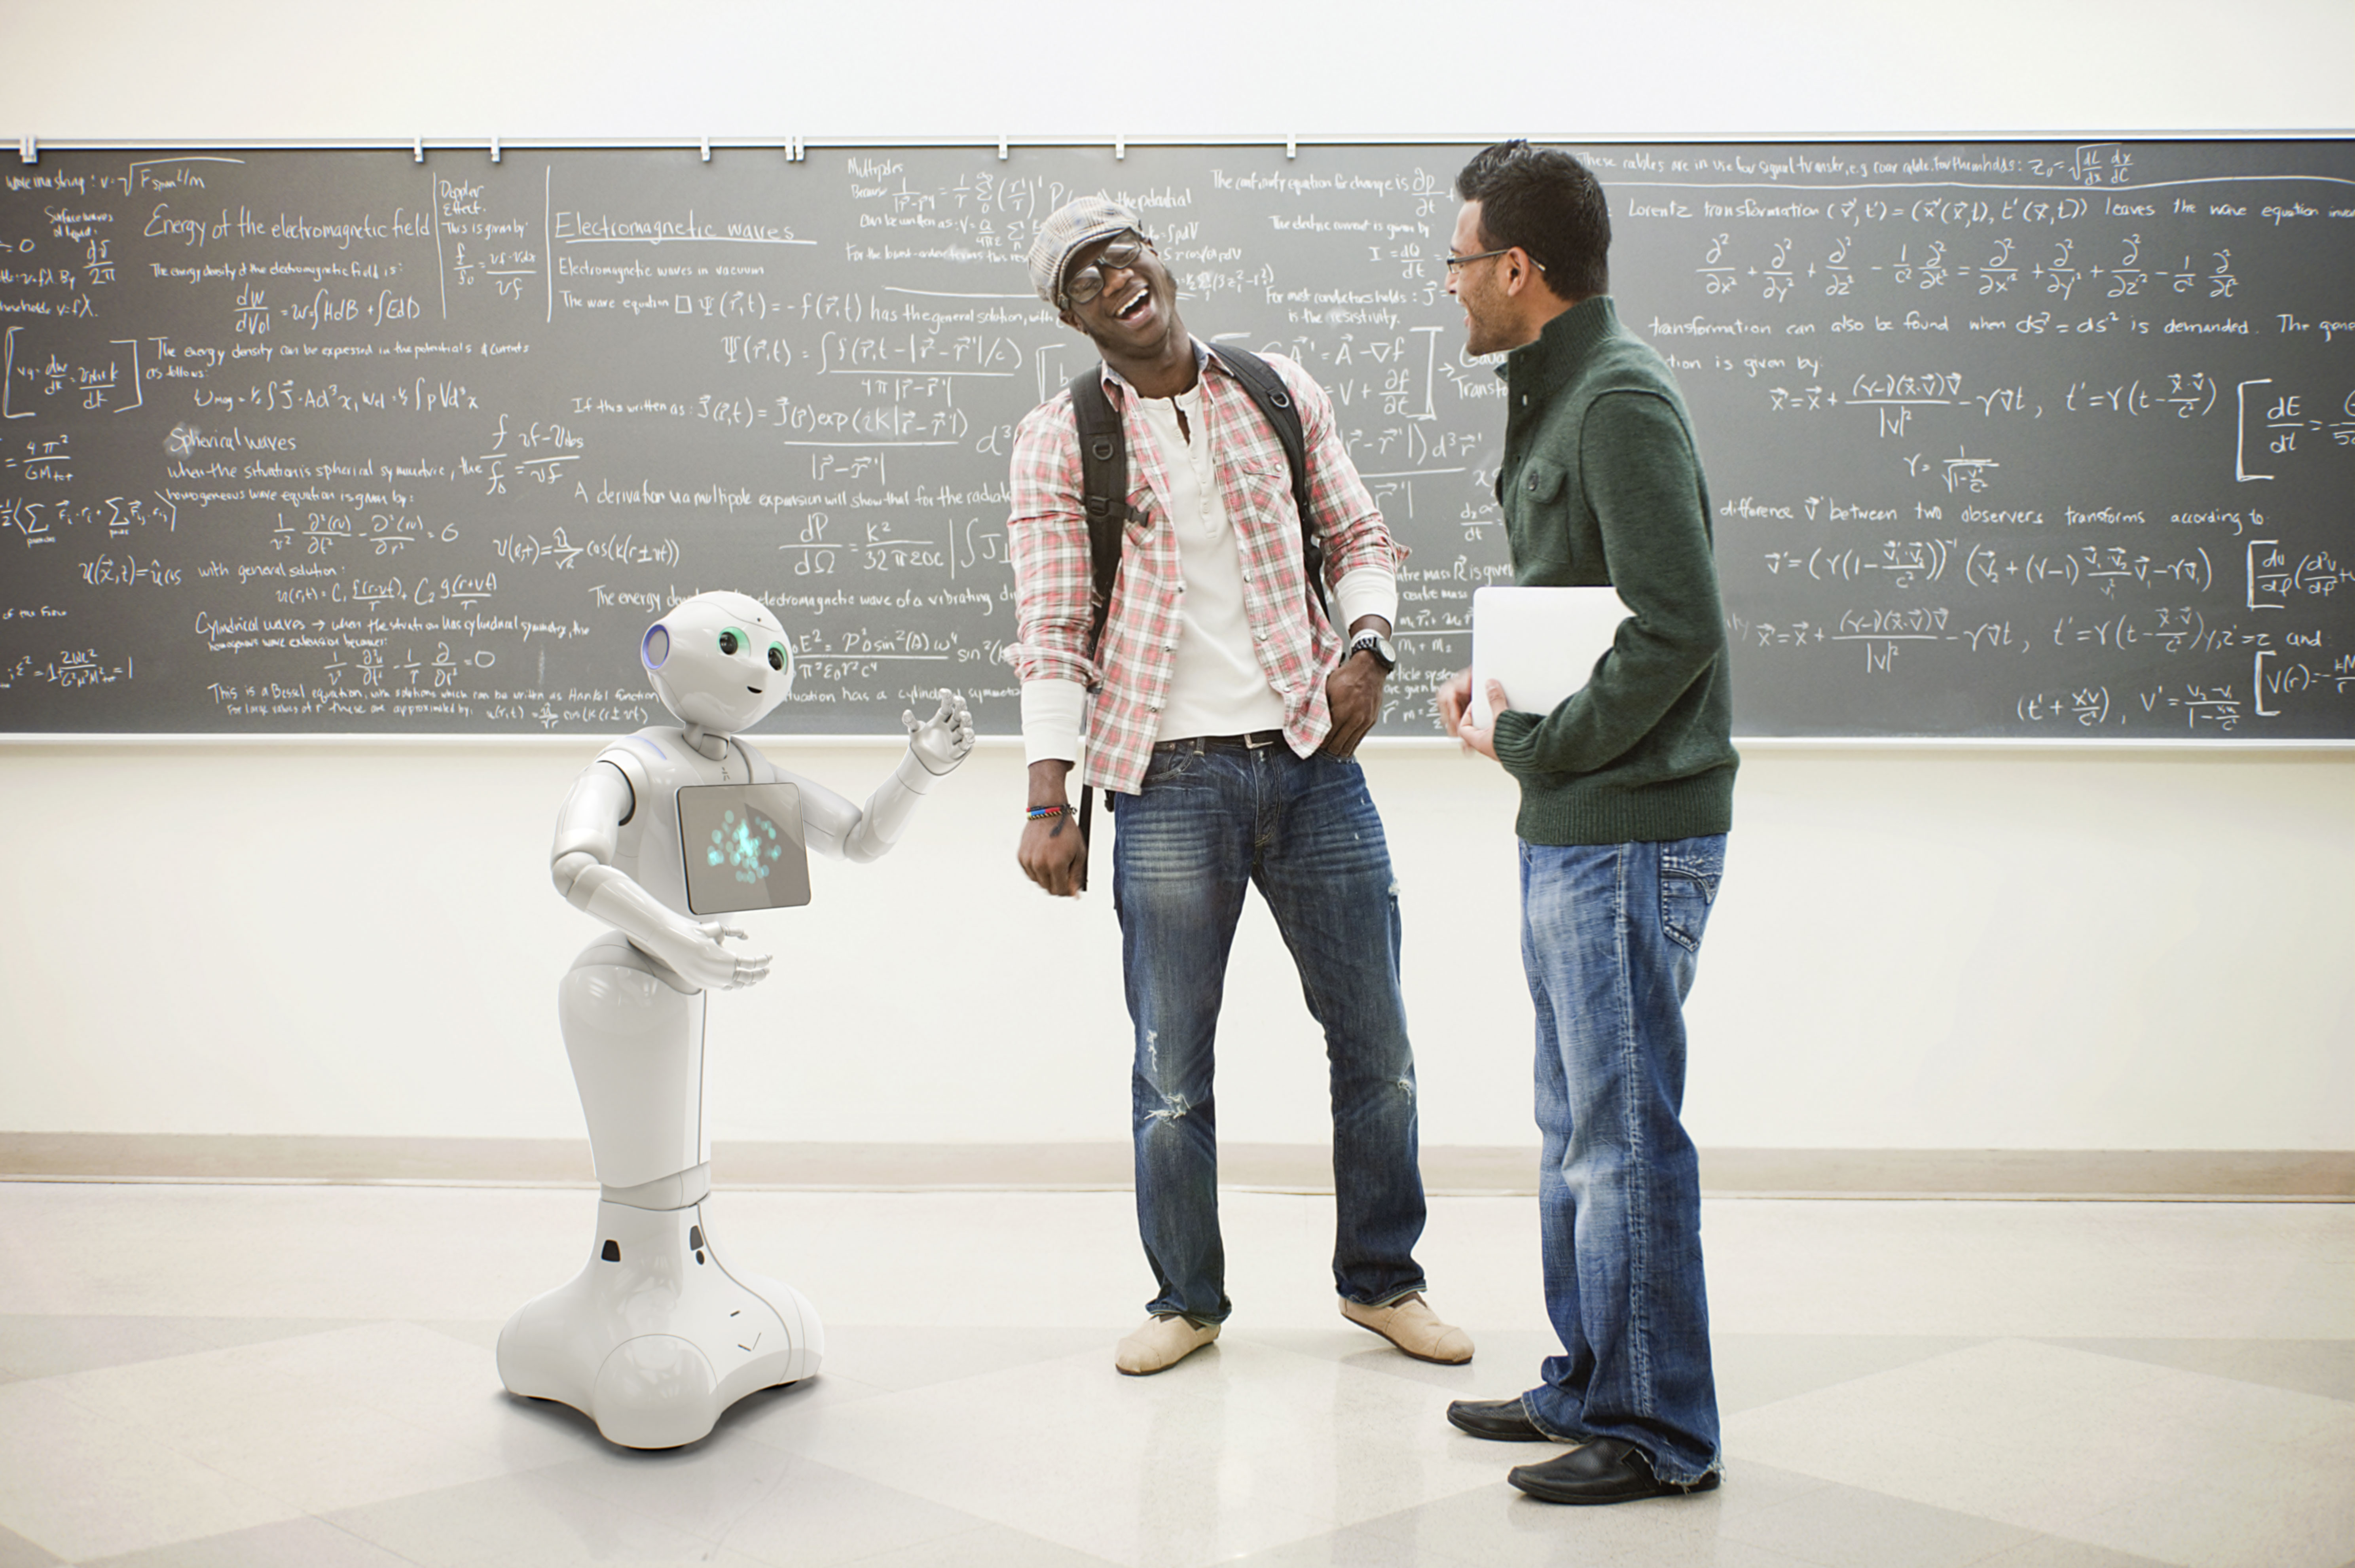 robot-pepper-ces